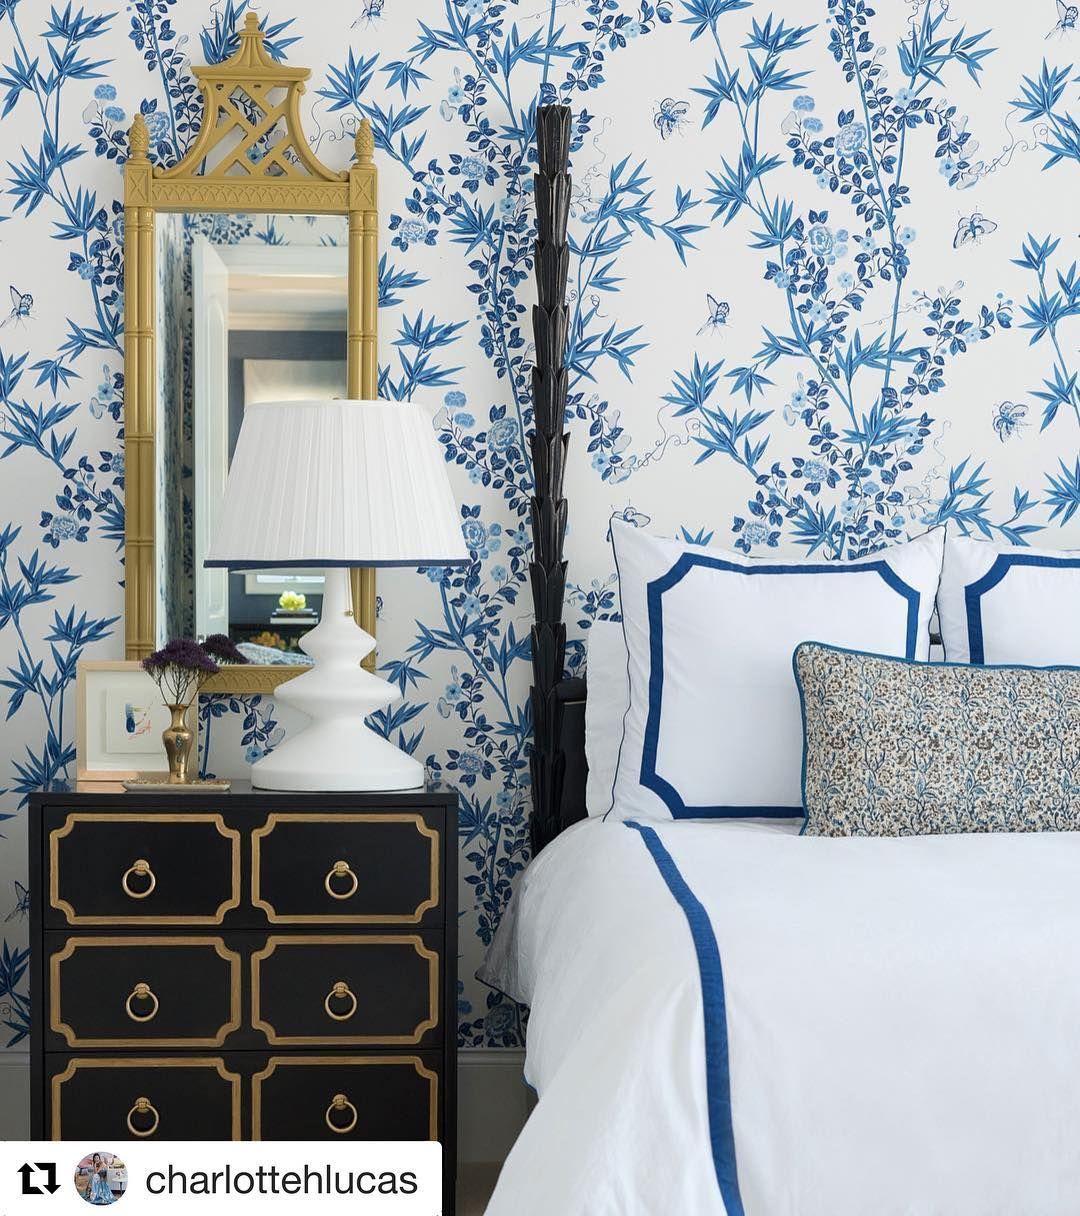 ed 10 A.M. EST on Instagra White master bedroom